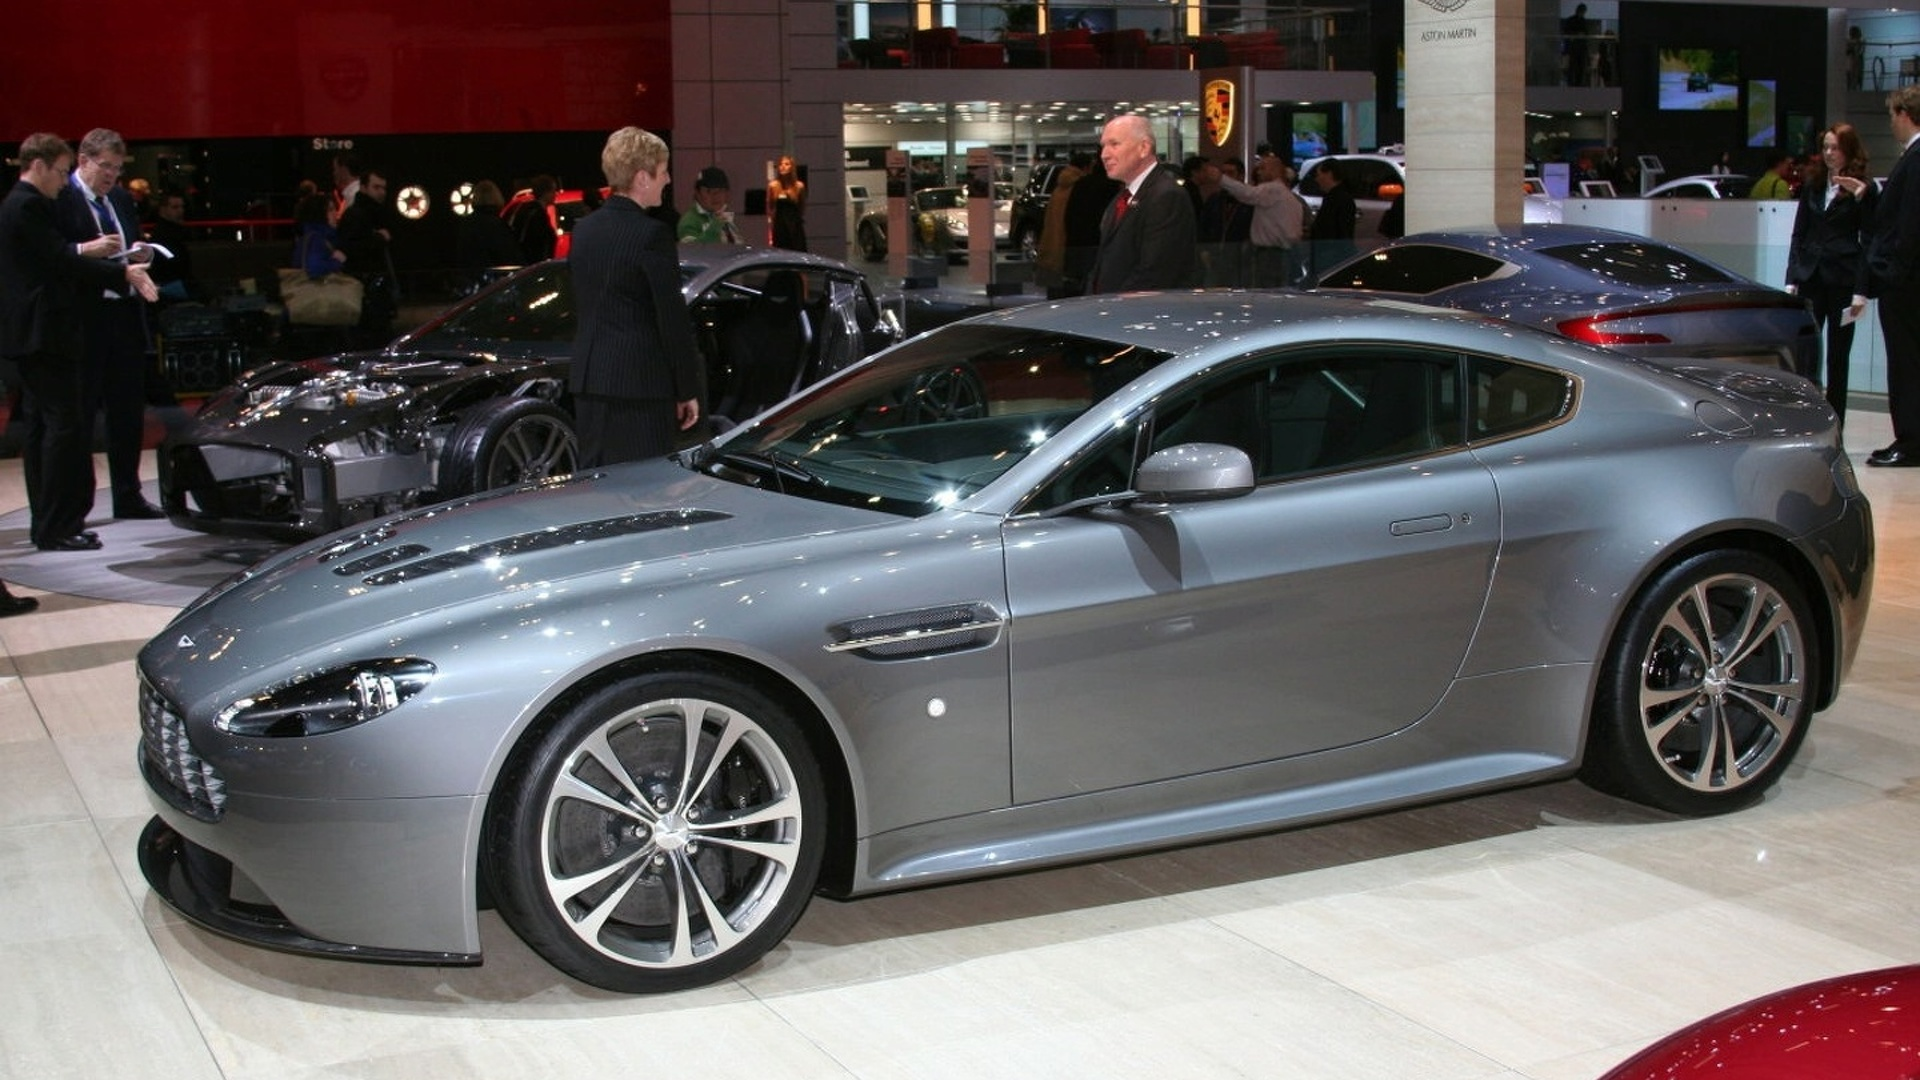 Aston Martin V Vantage News And Reviews Motorcom UK - Aston martin v8 vantage 2018